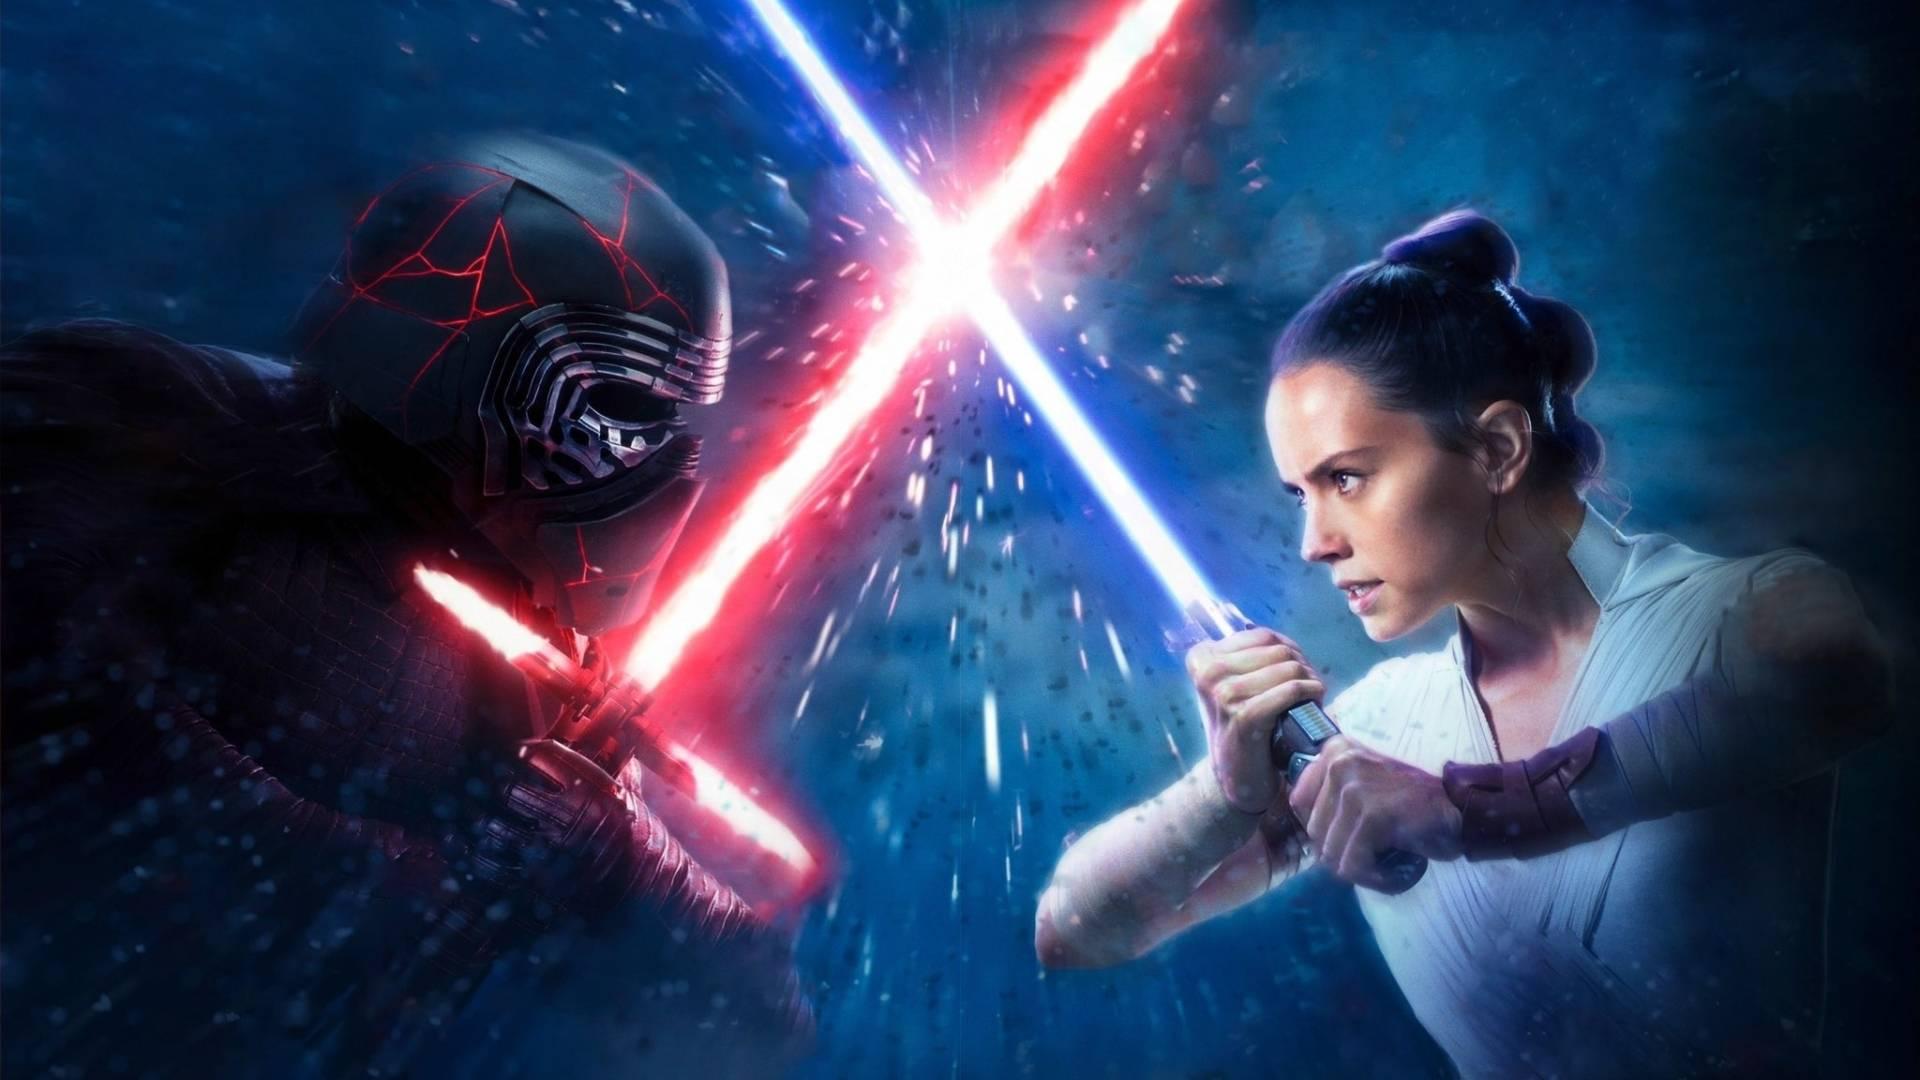 star wars ubisoft massive lucasfilm games juego videojuego